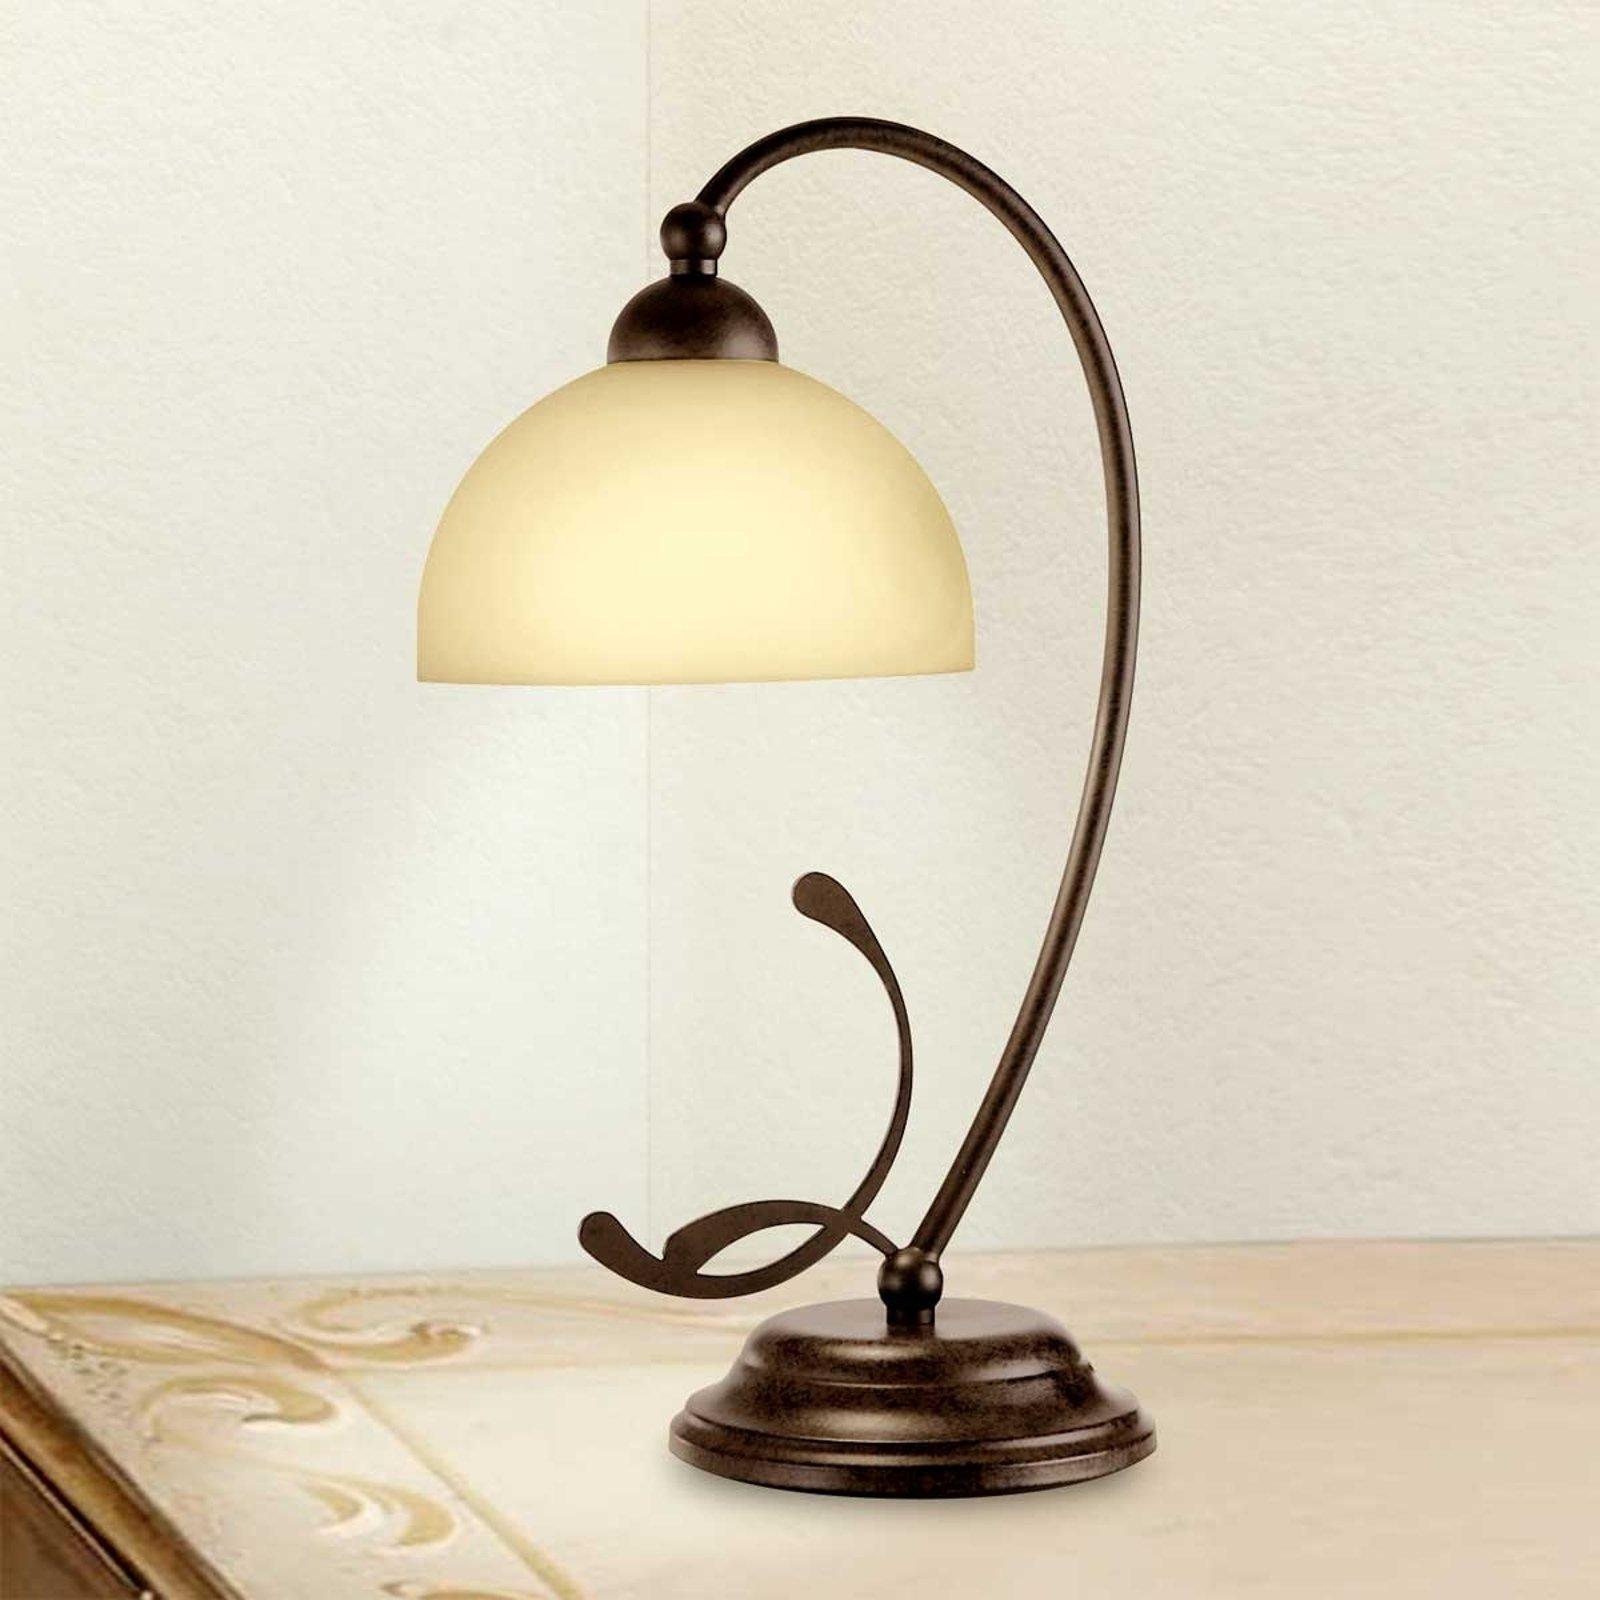 Rustikk bordlampe Lorenzo